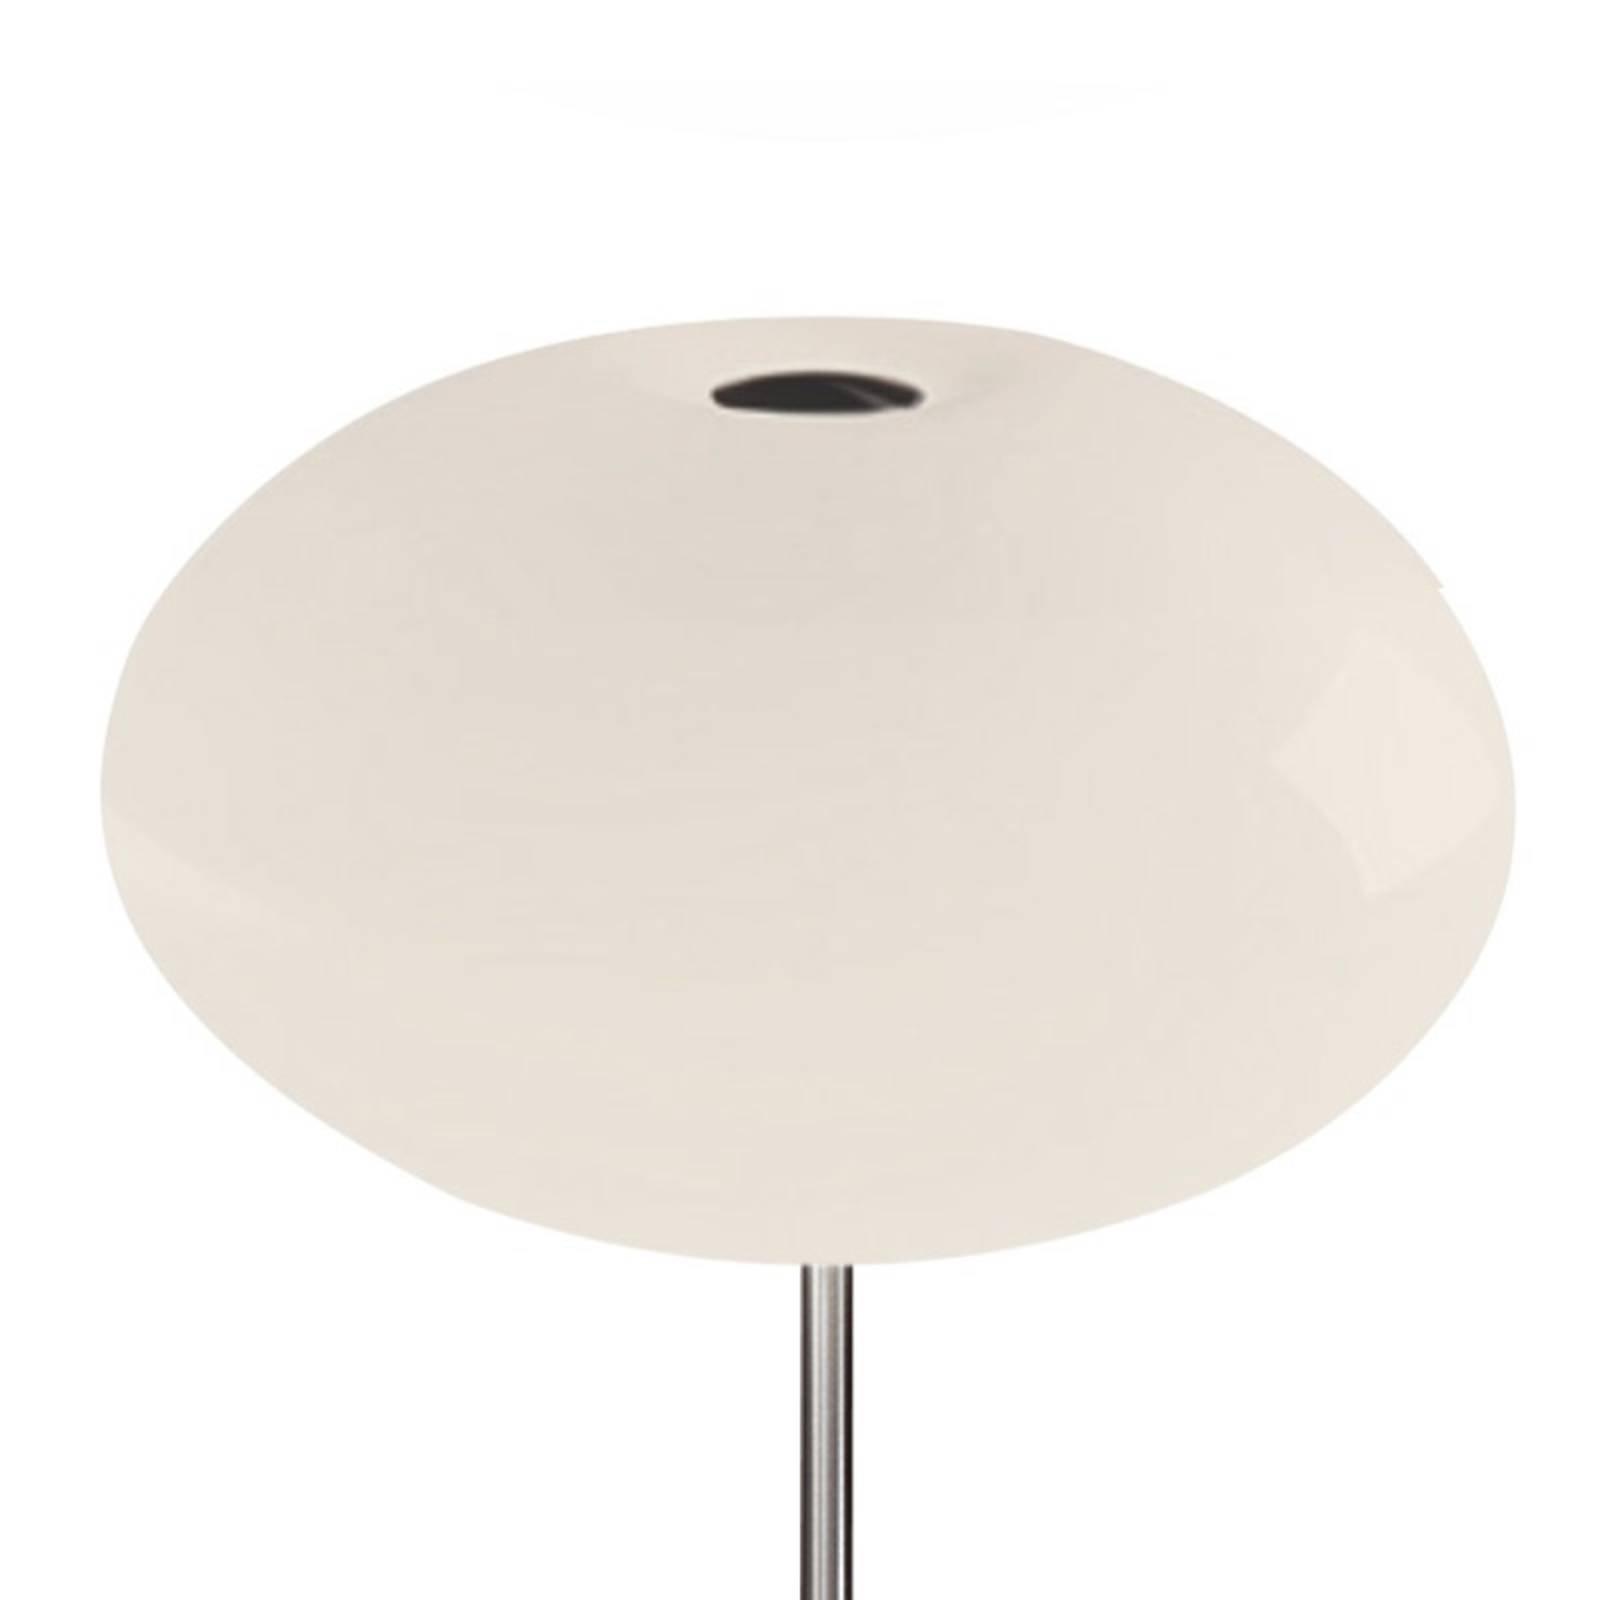 Casablanca Aih bordlampe, Ø 28 cm krem blank